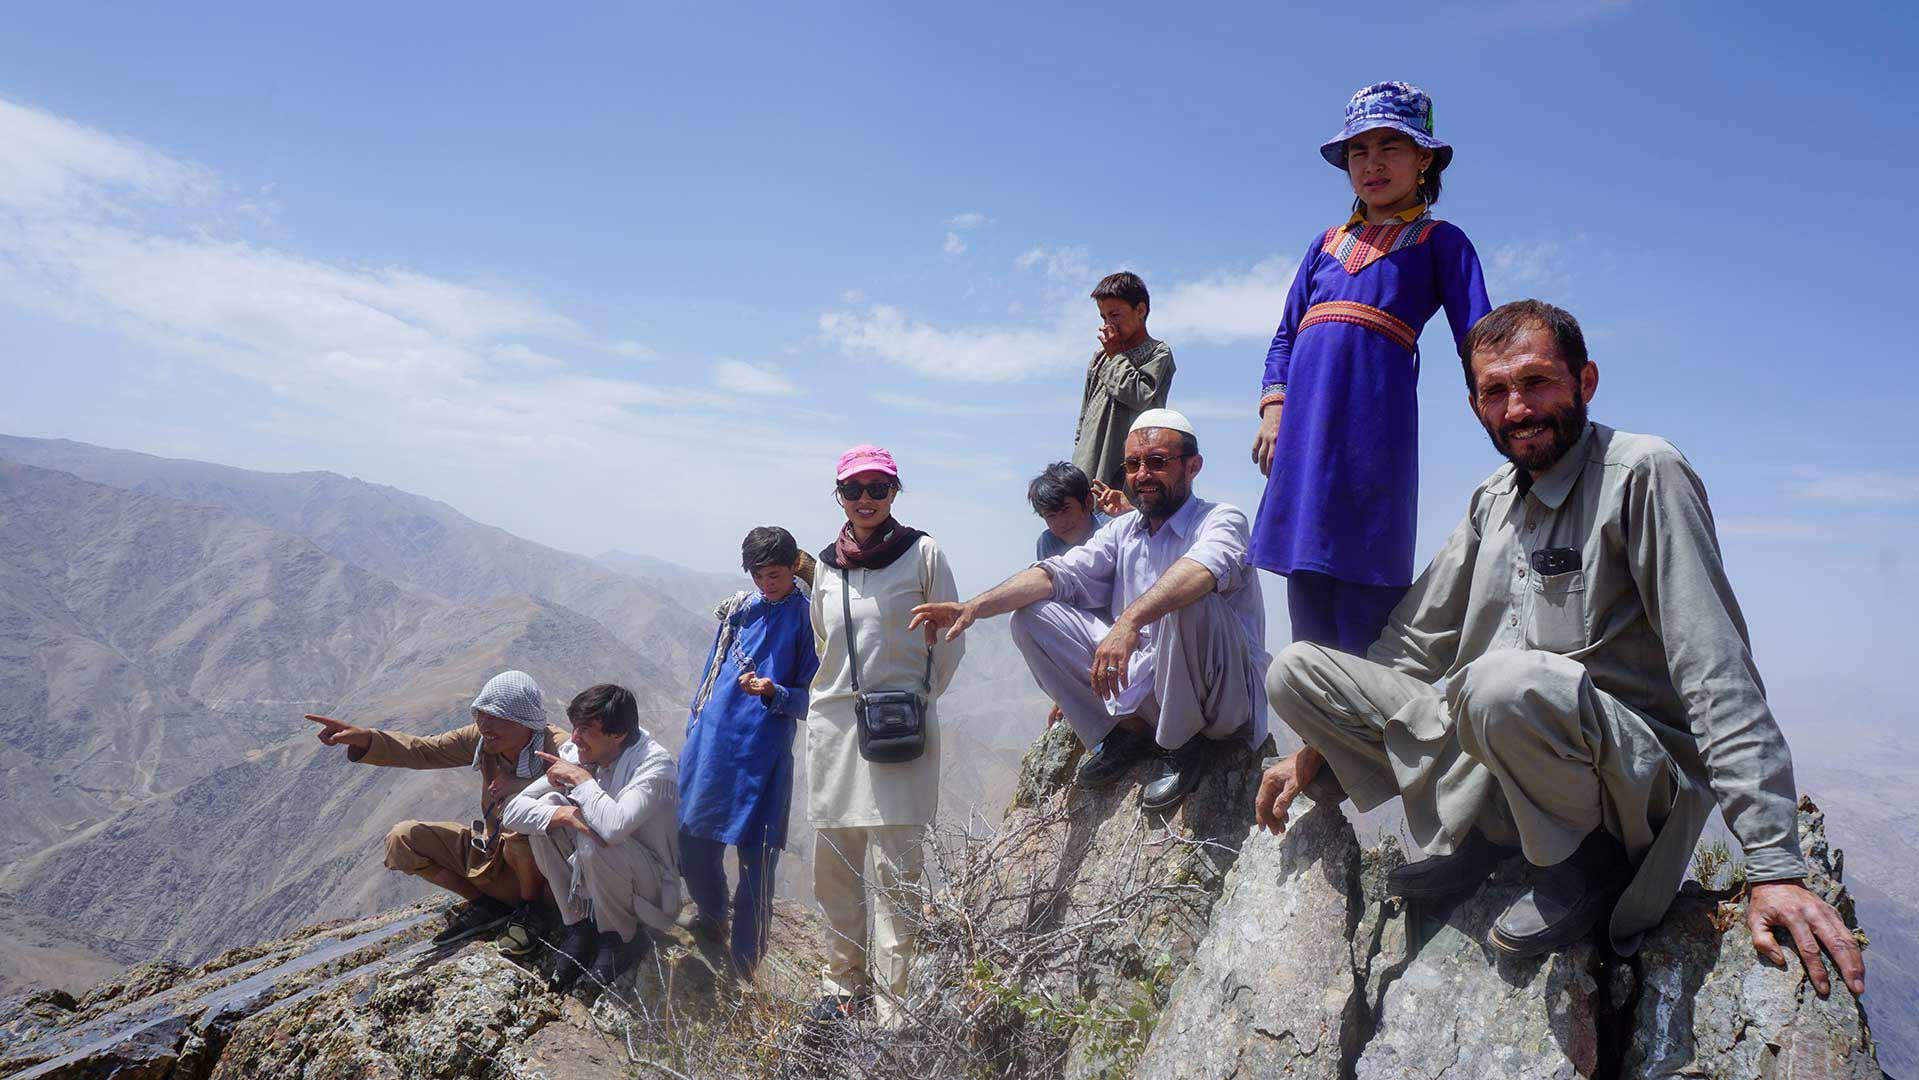 کوهنوردی در افغانستان دایکندی